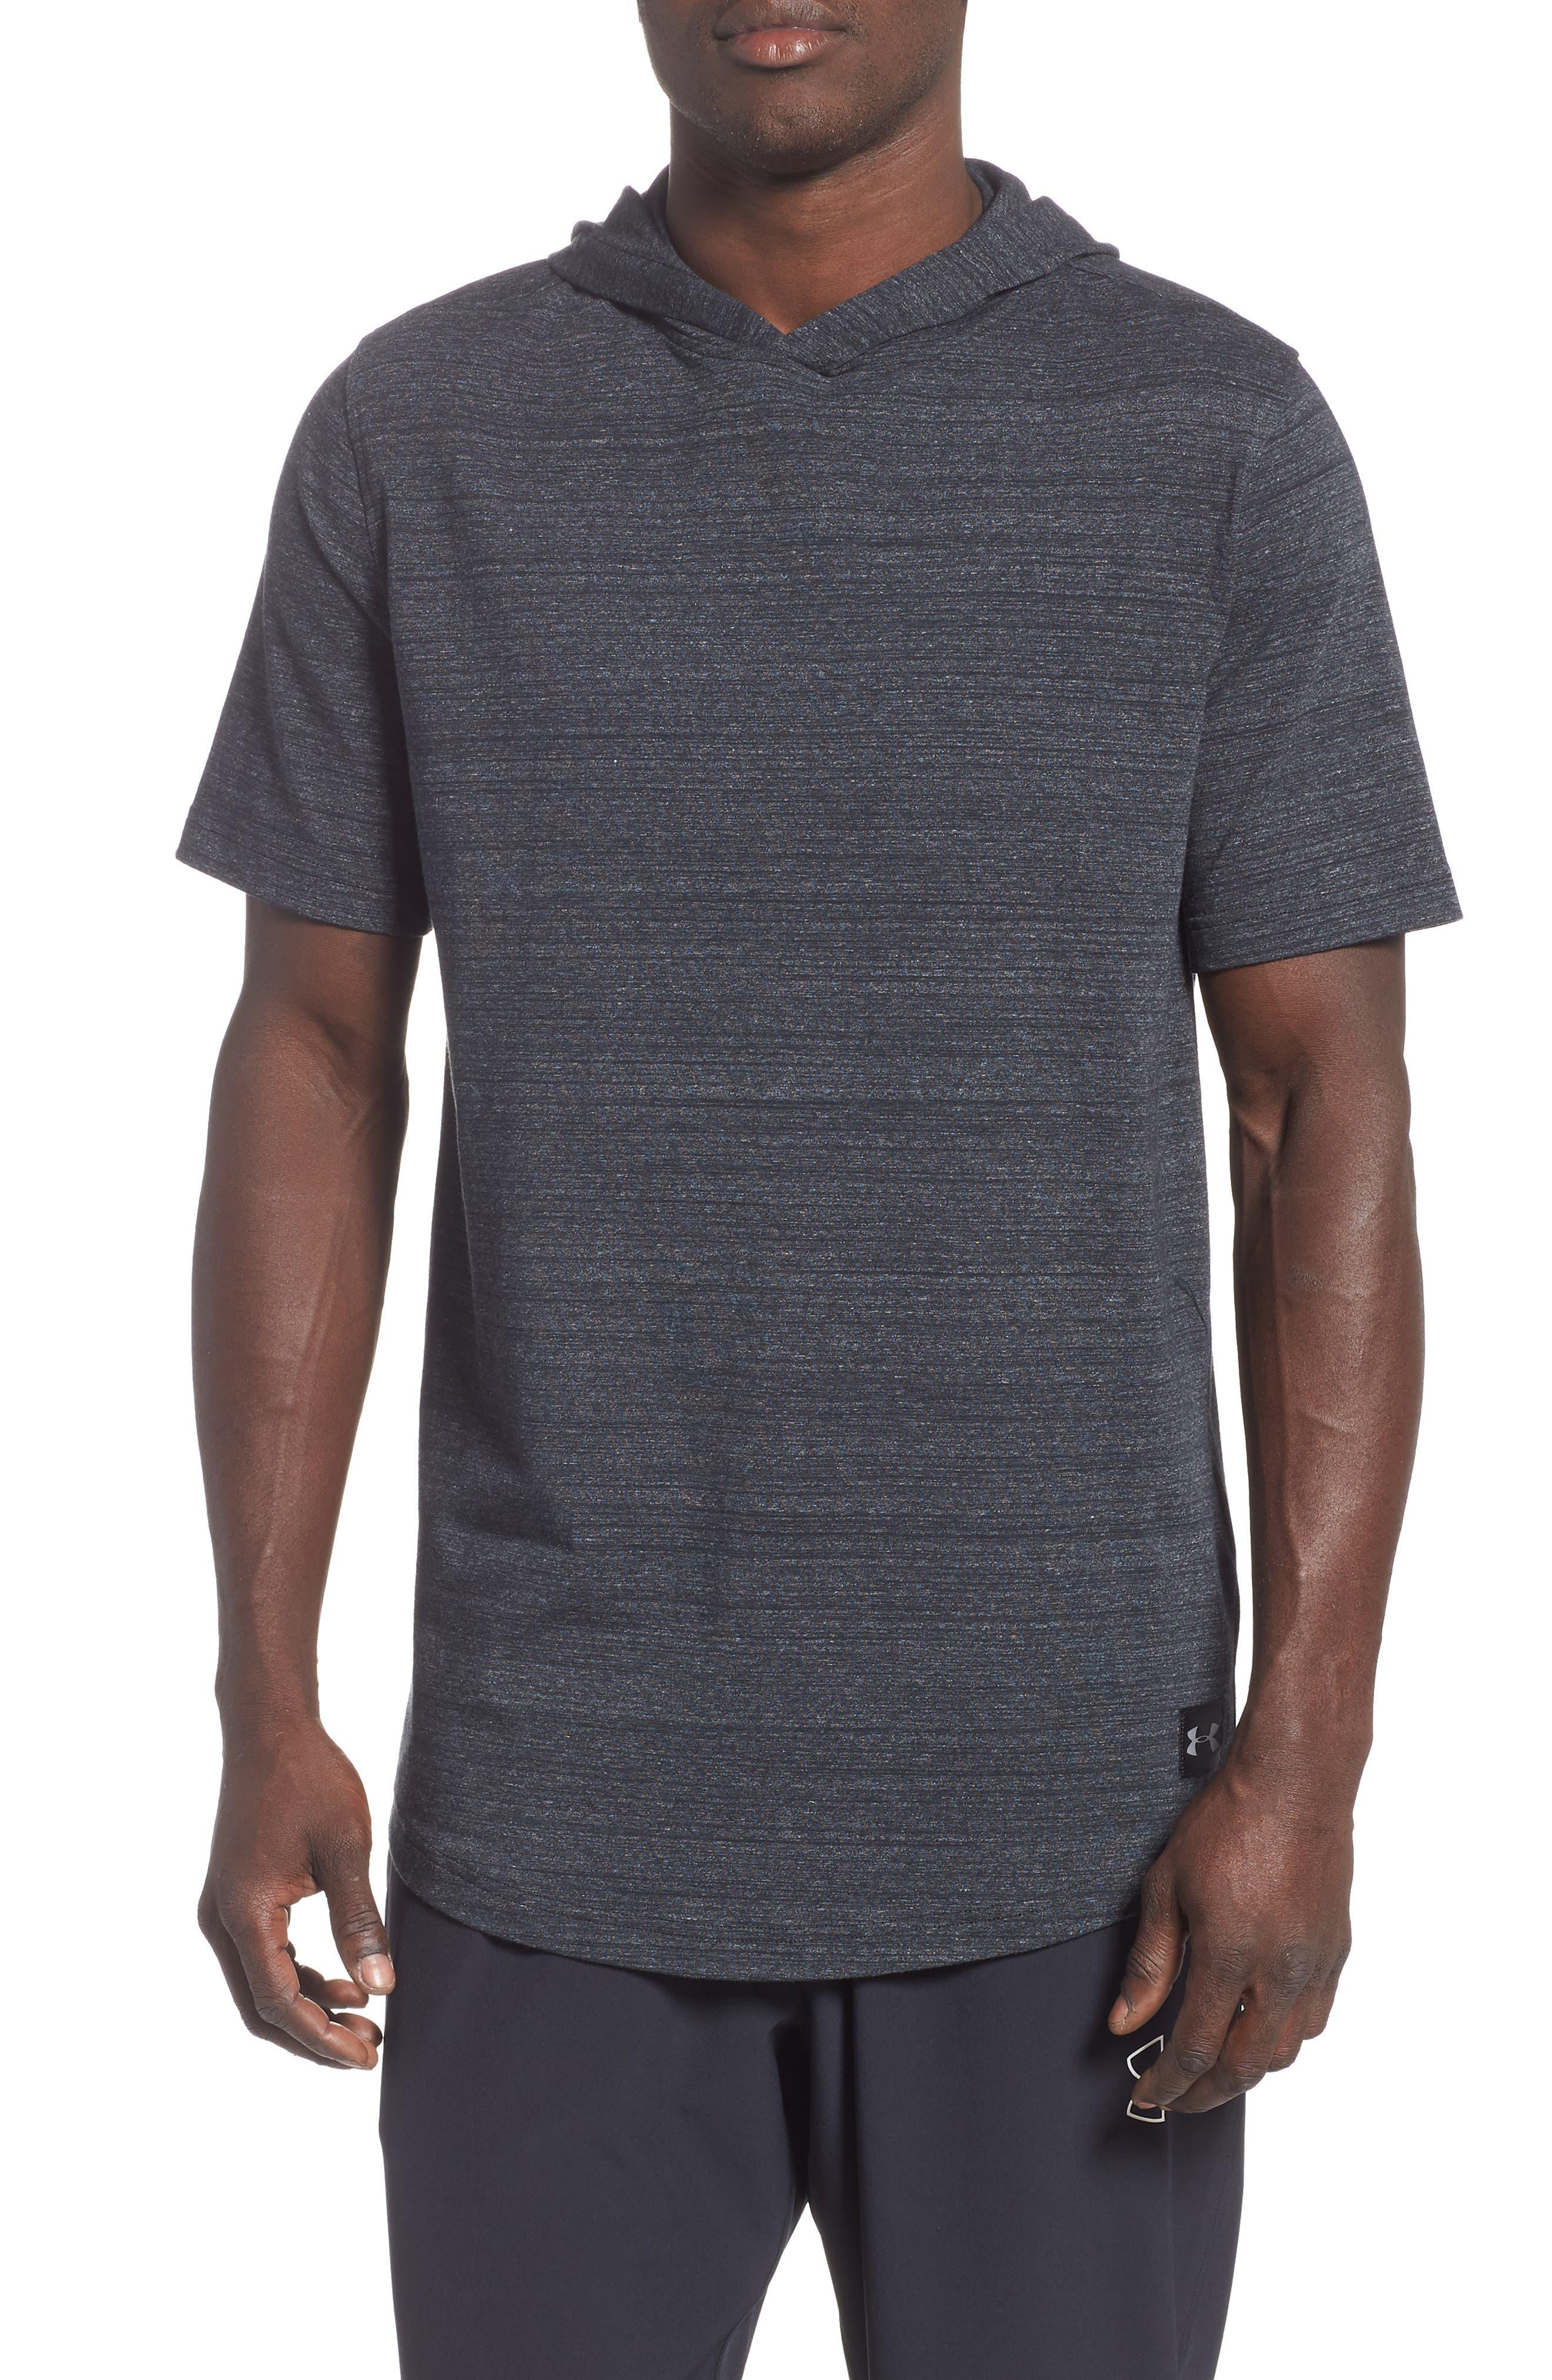 Under Armour Sportstyle Short Sleeve Hoodie, Black